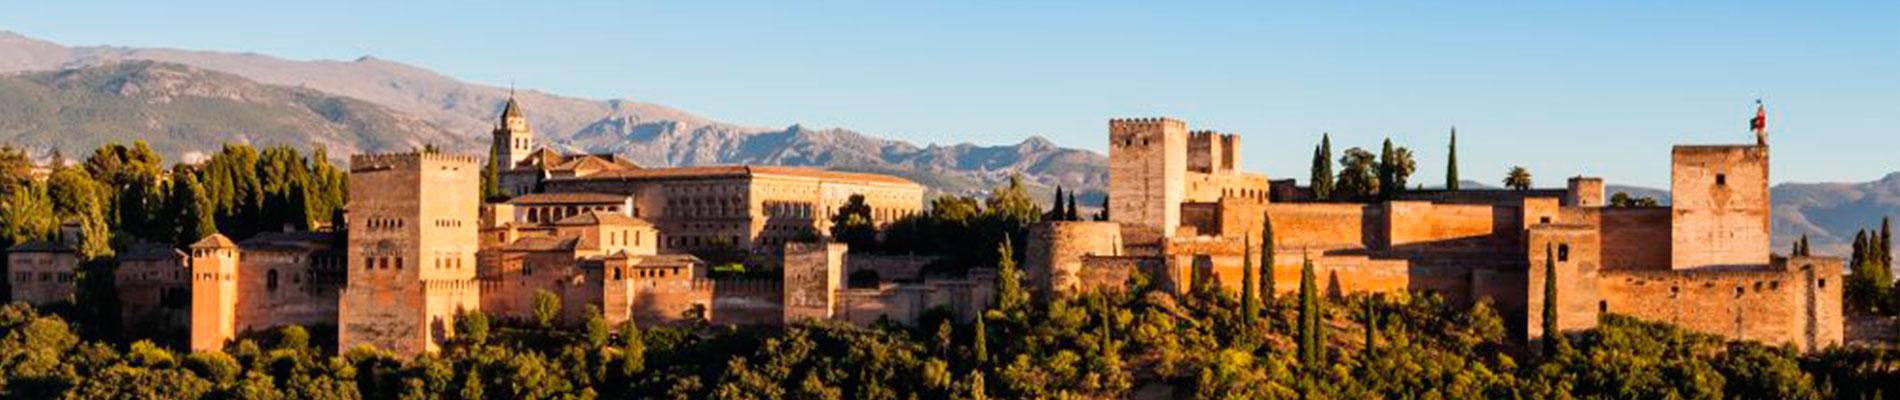 granada-alhambra-palace-st